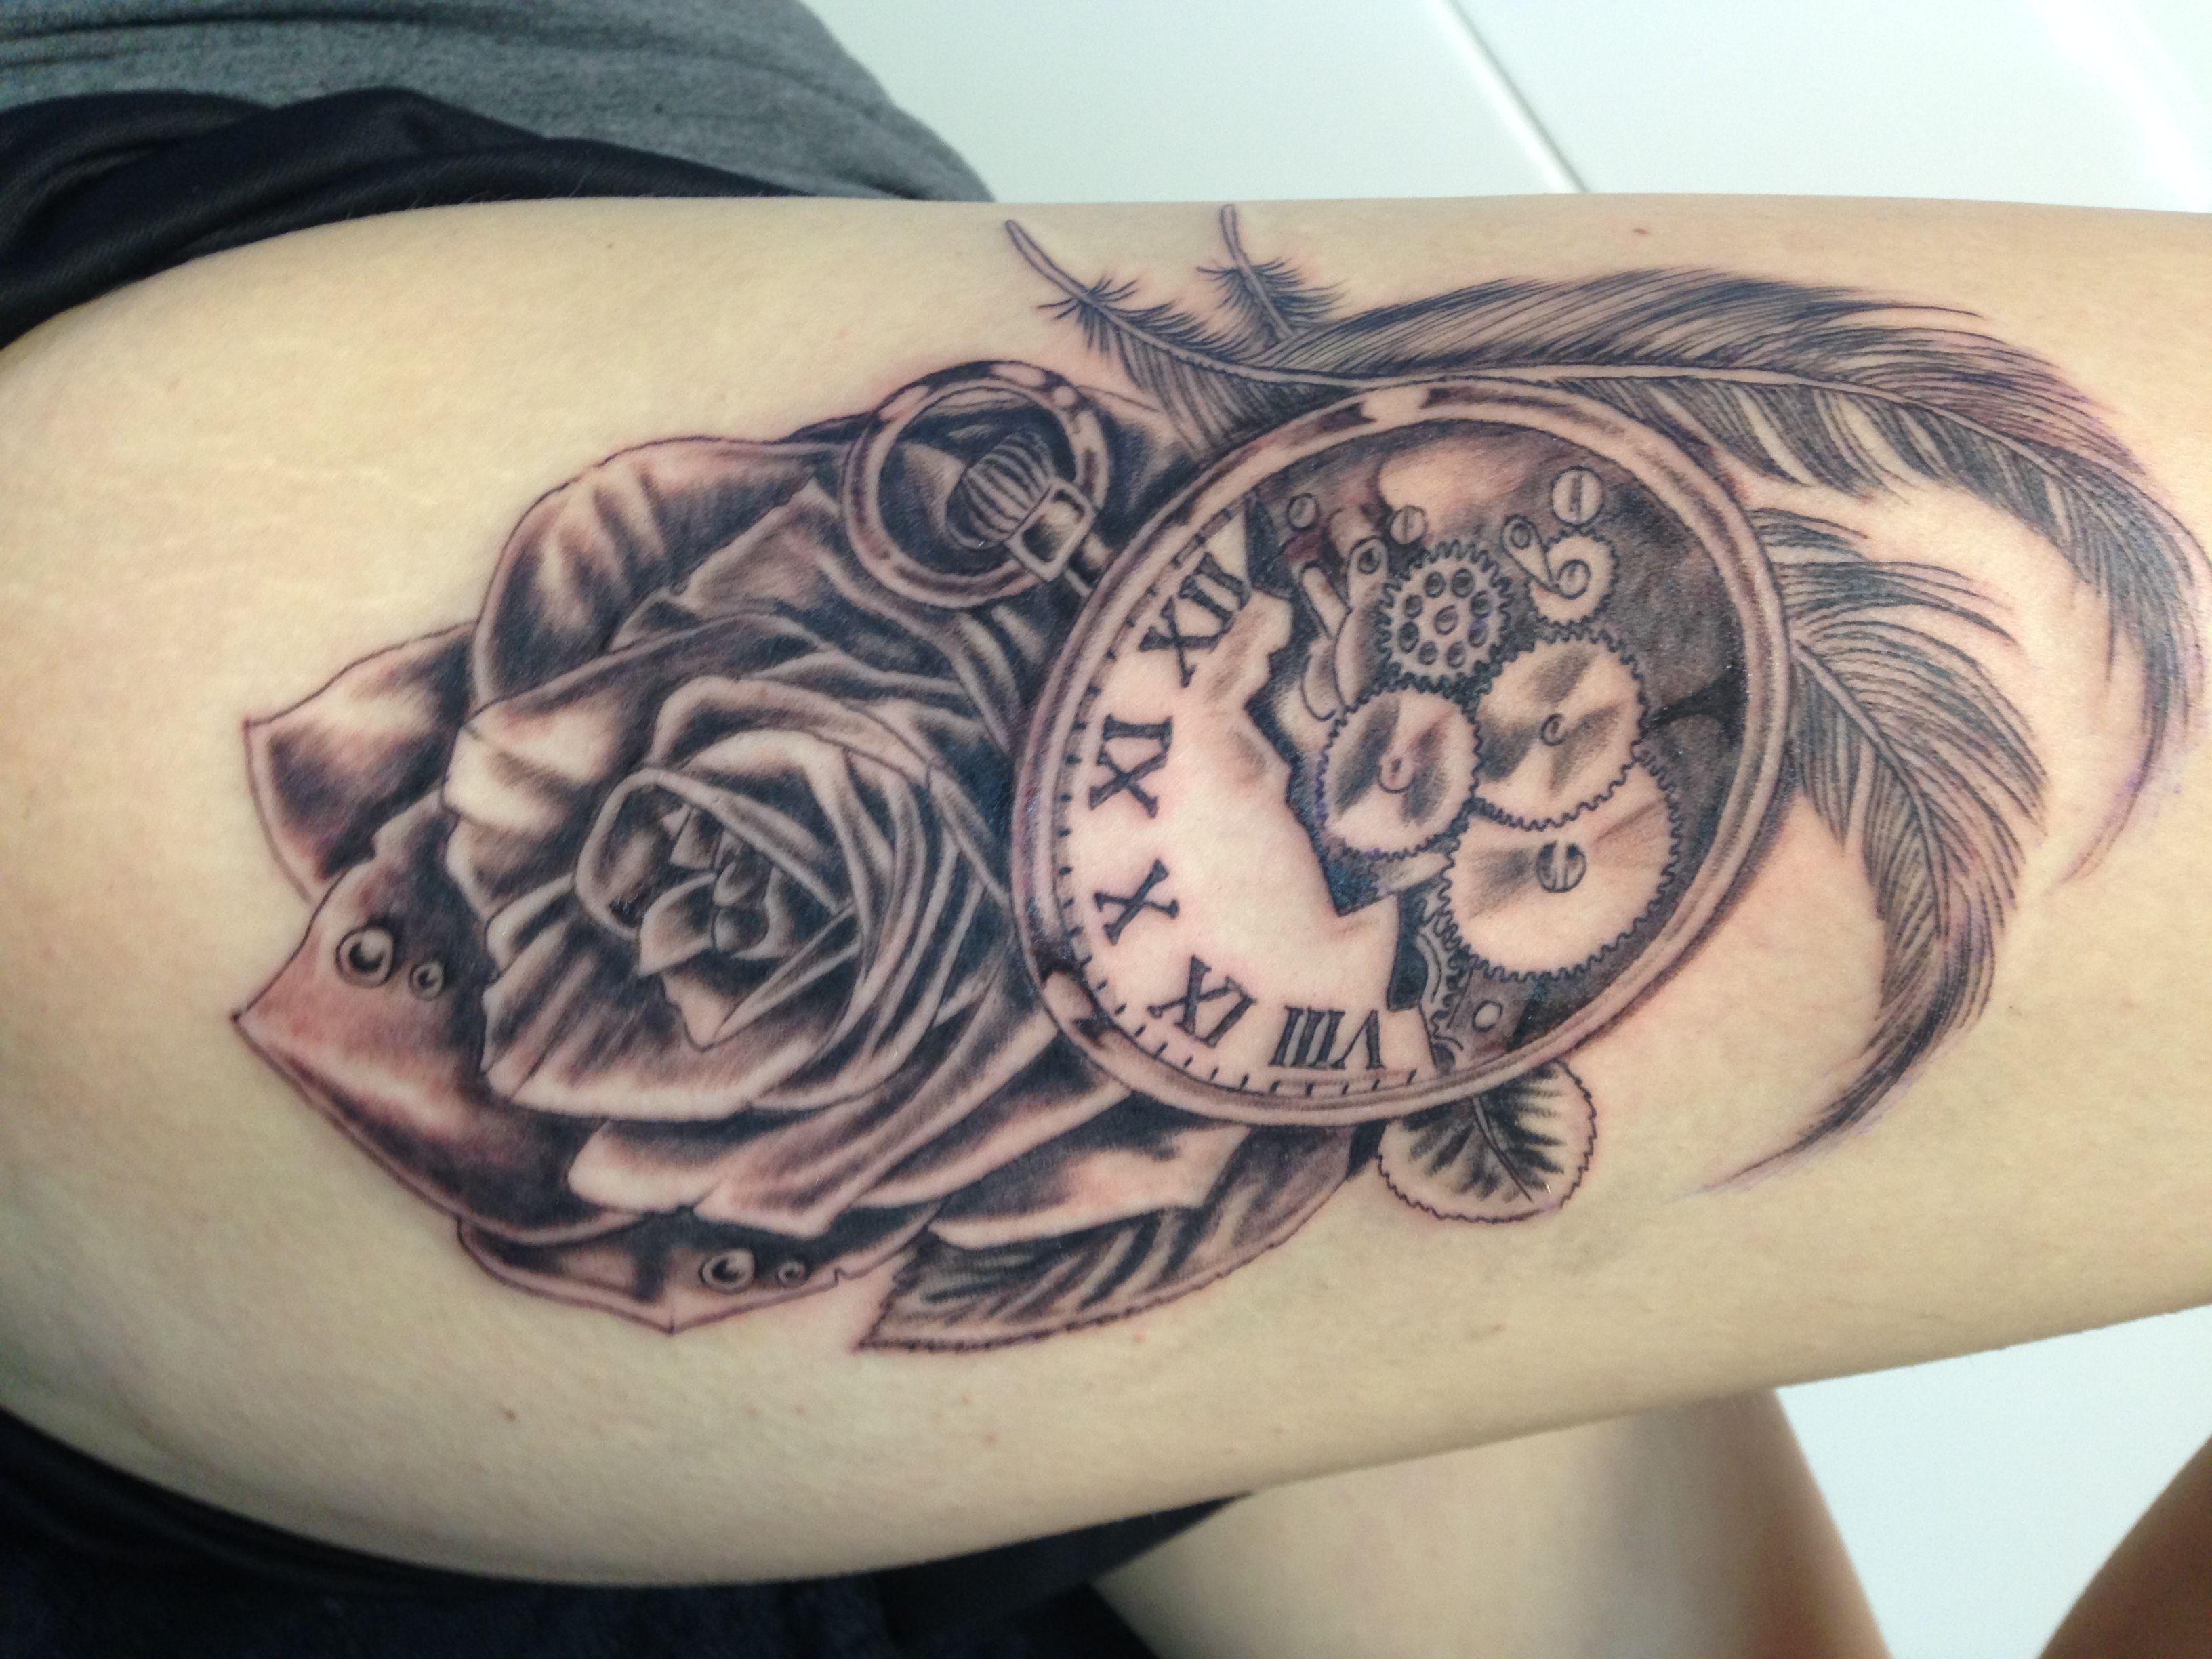 bovenbeen - Tattoo | Pinterest - Tatoeages en Nagel